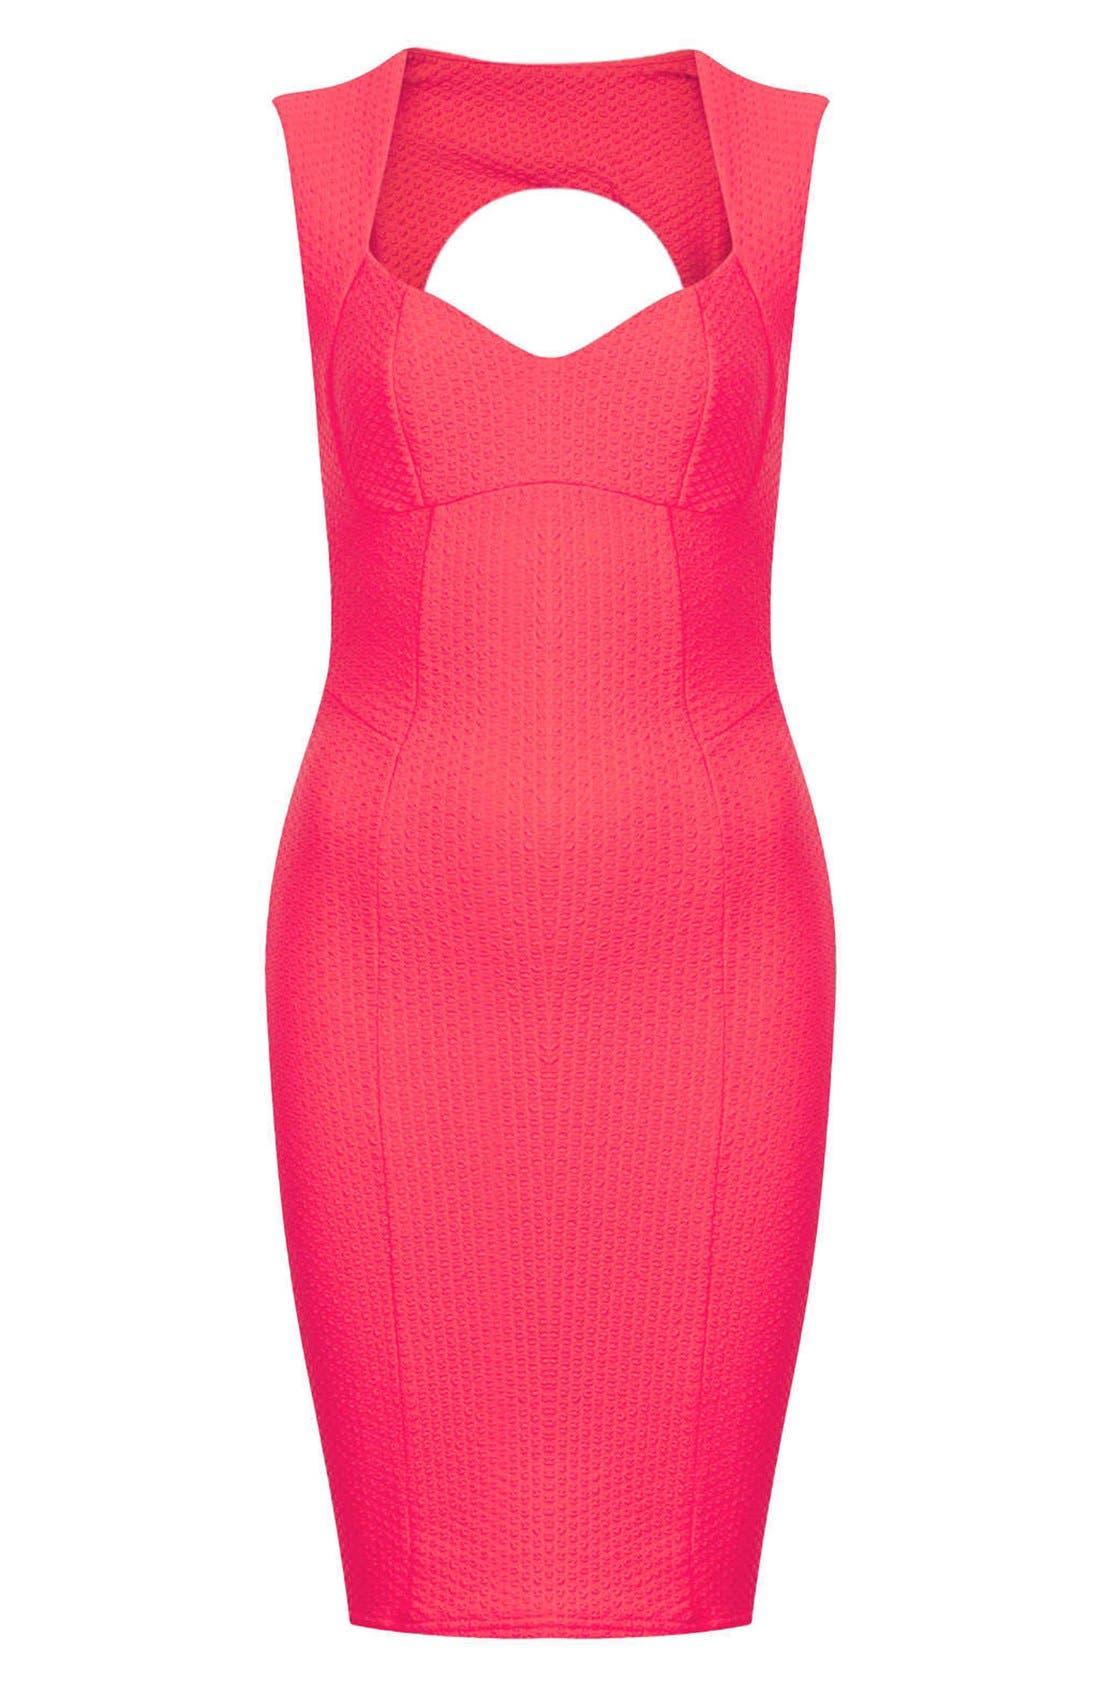 Alternate Image 3  - Topshop Sweetheart Neckline Body-Con Dress (Petite)